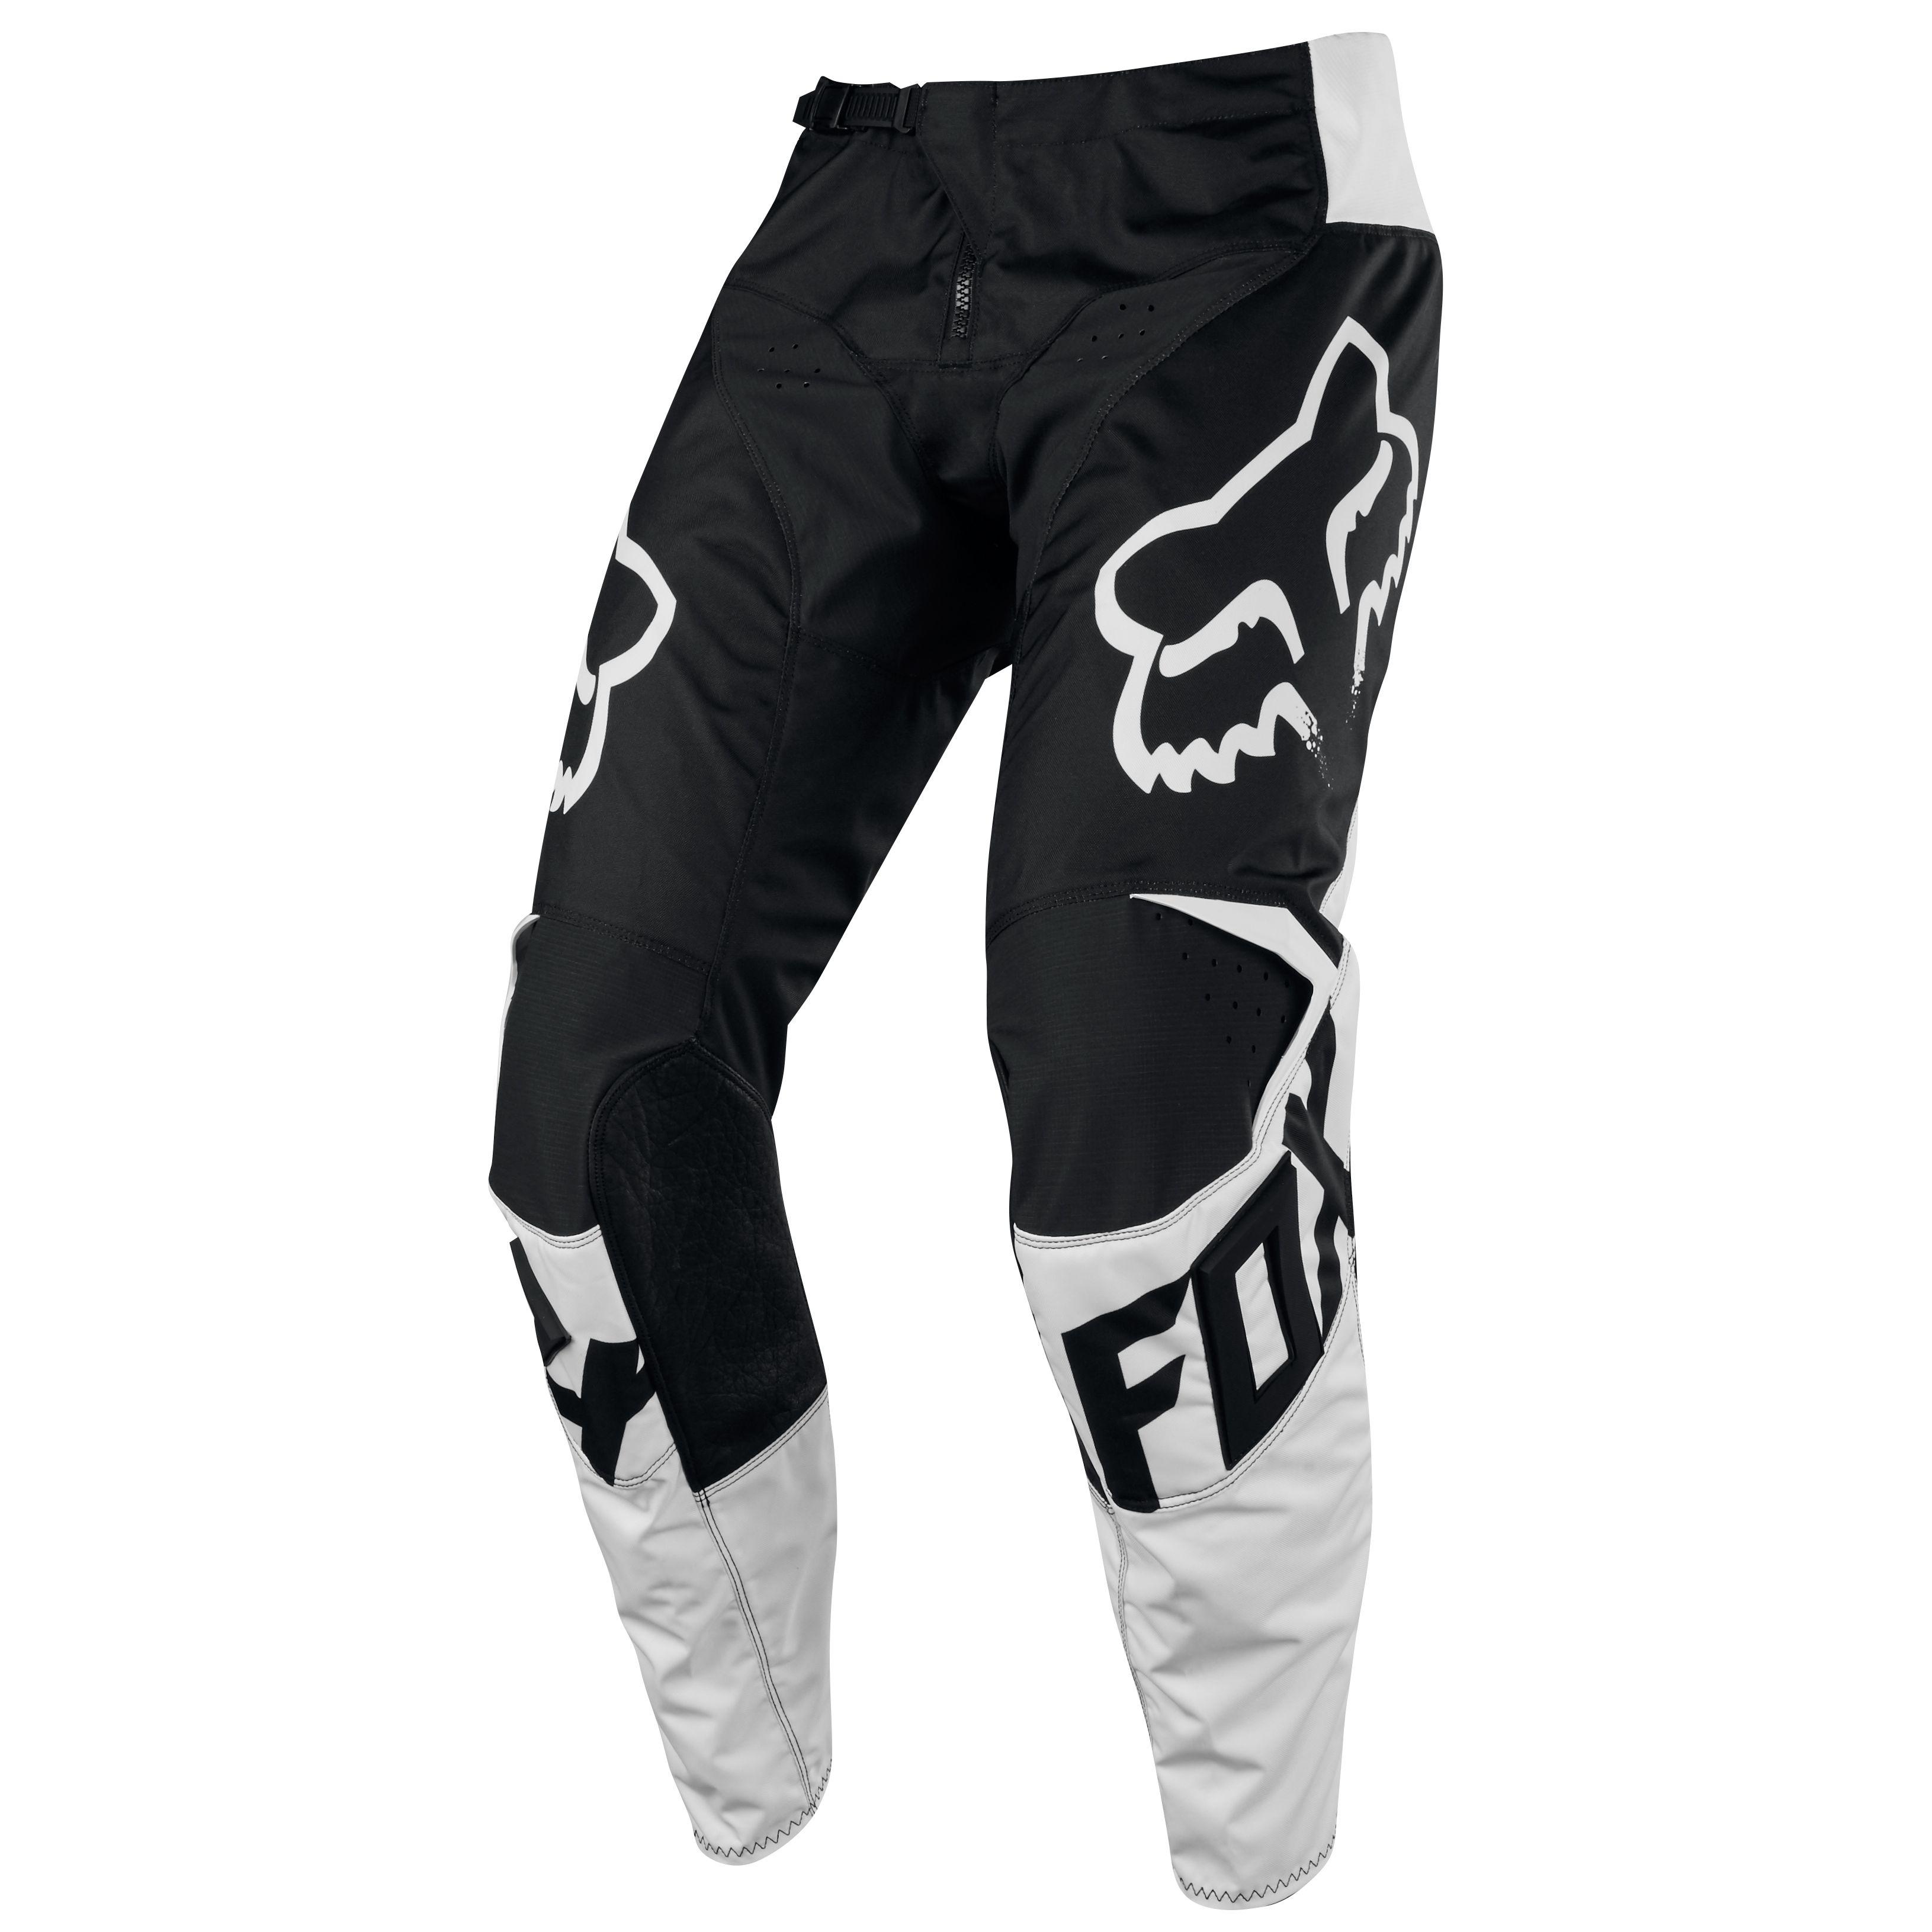 pantalon cross fox 180 race noir 2018 tenue cross. Black Bedroom Furniture Sets. Home Design Ideas